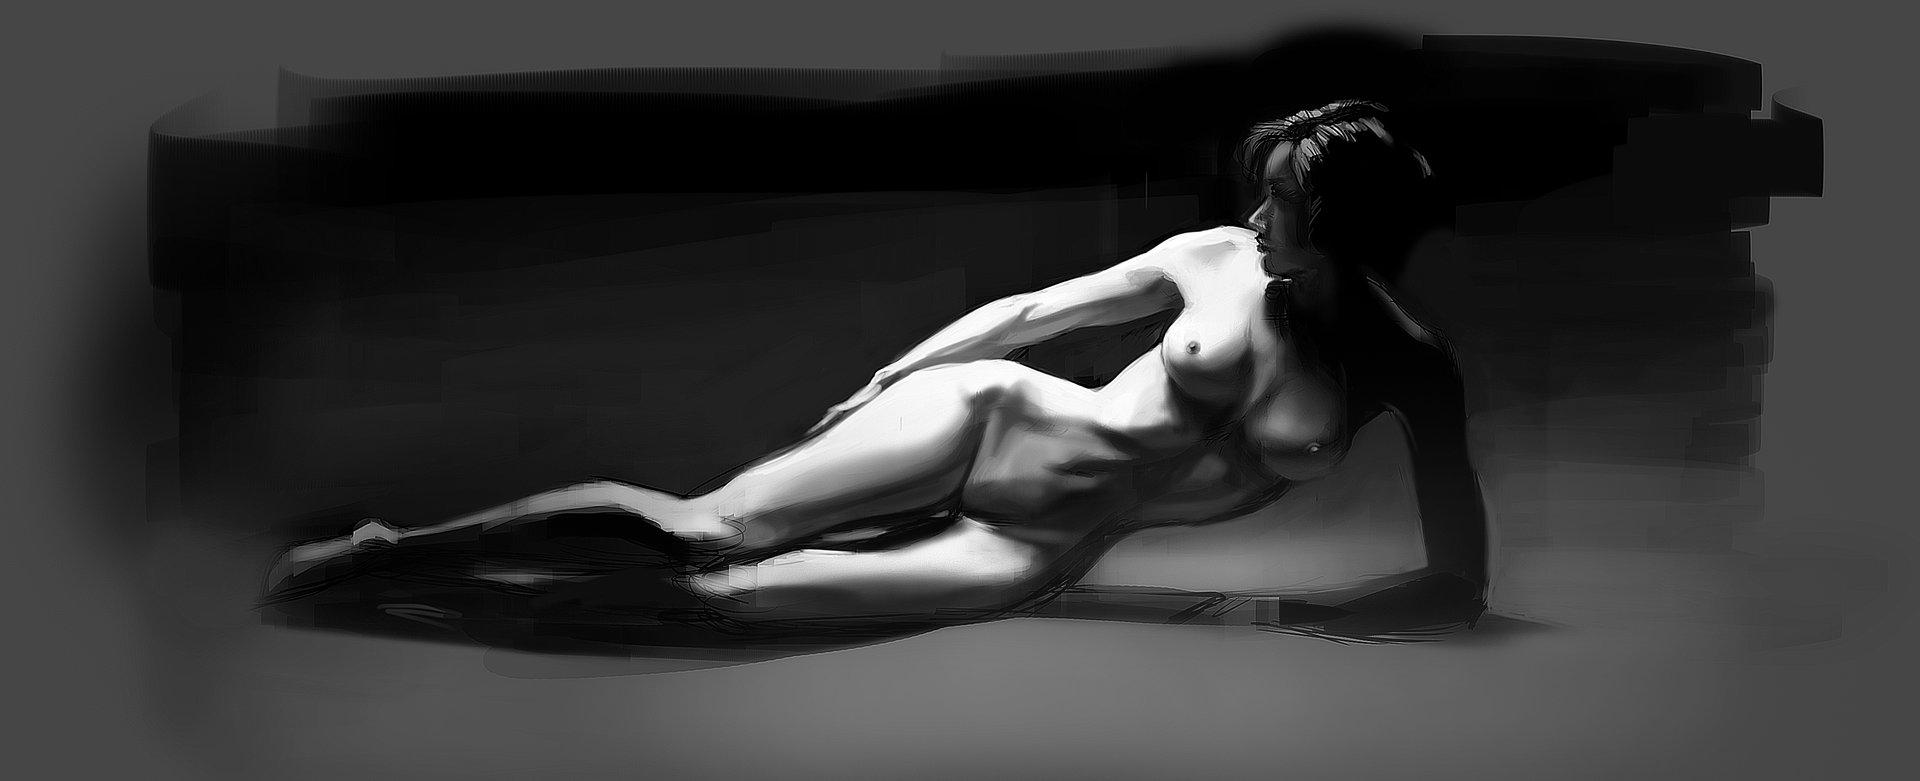 Alexandra reeves figurepracticeday1